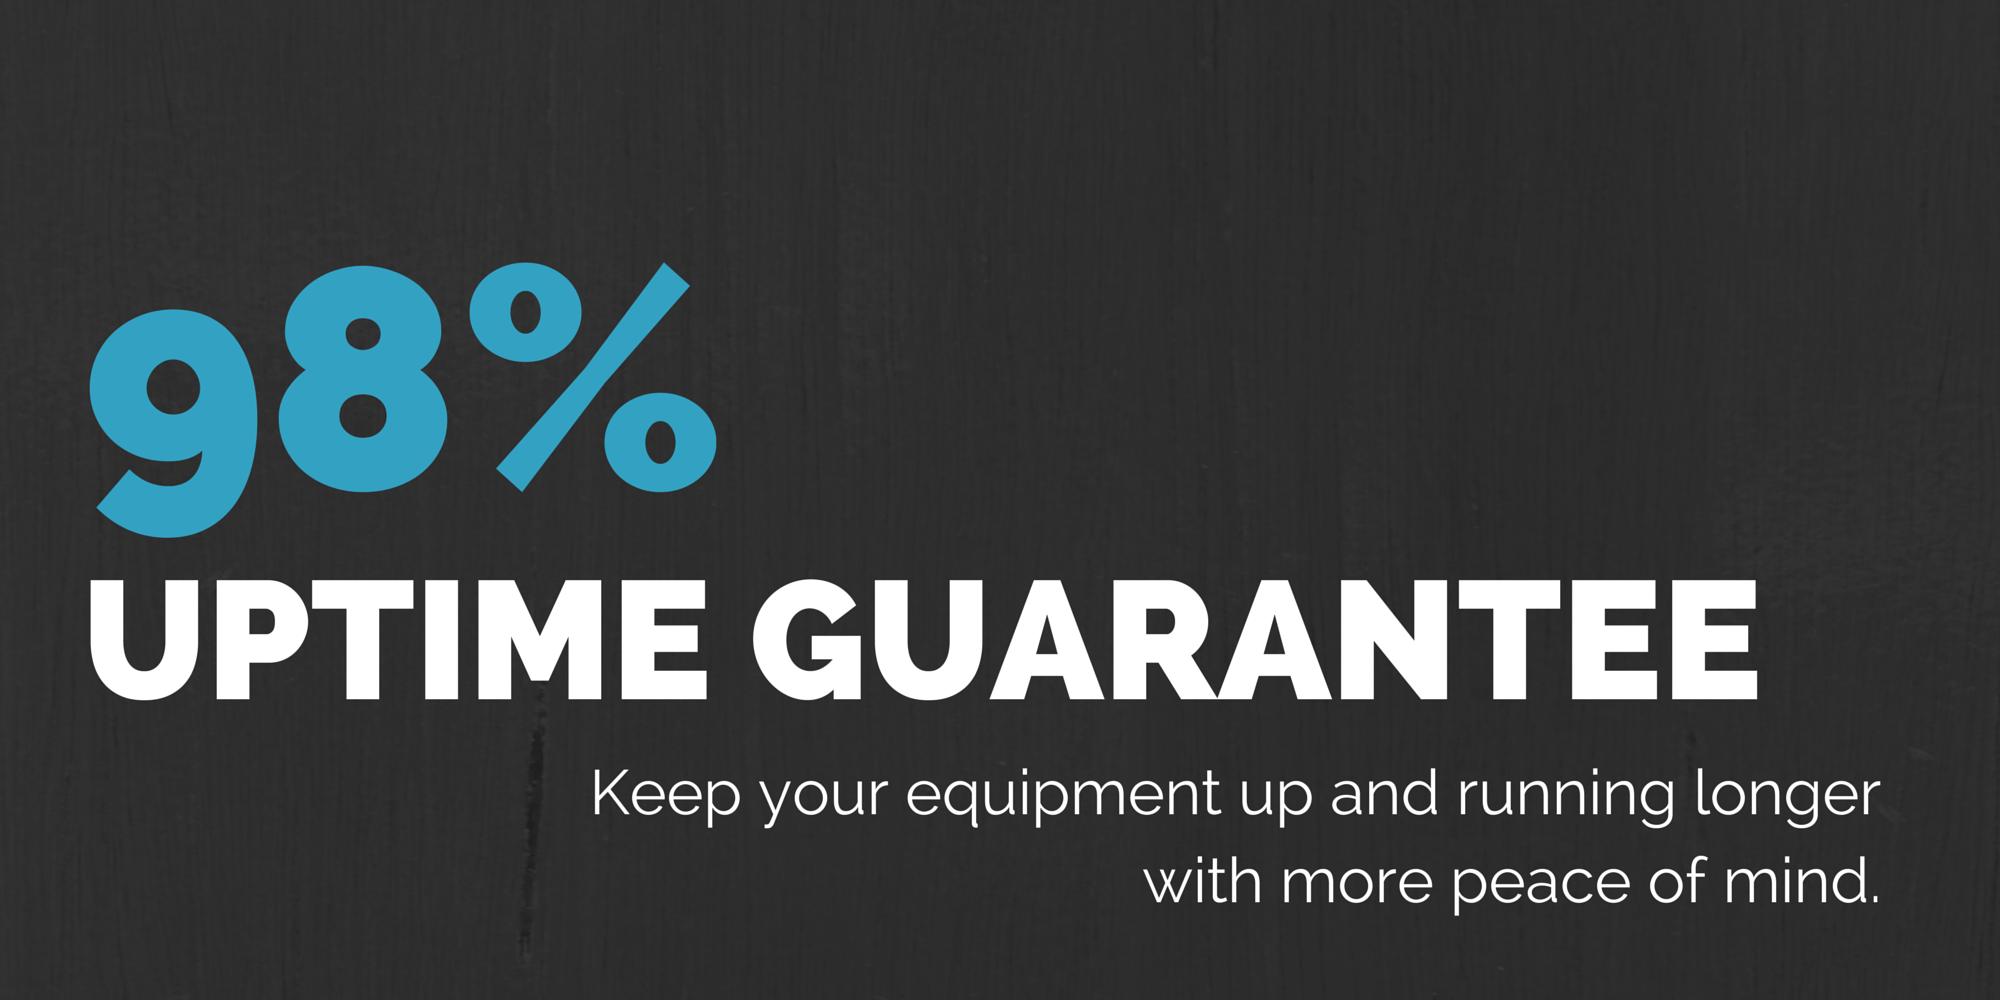 98_uptime_guarantee